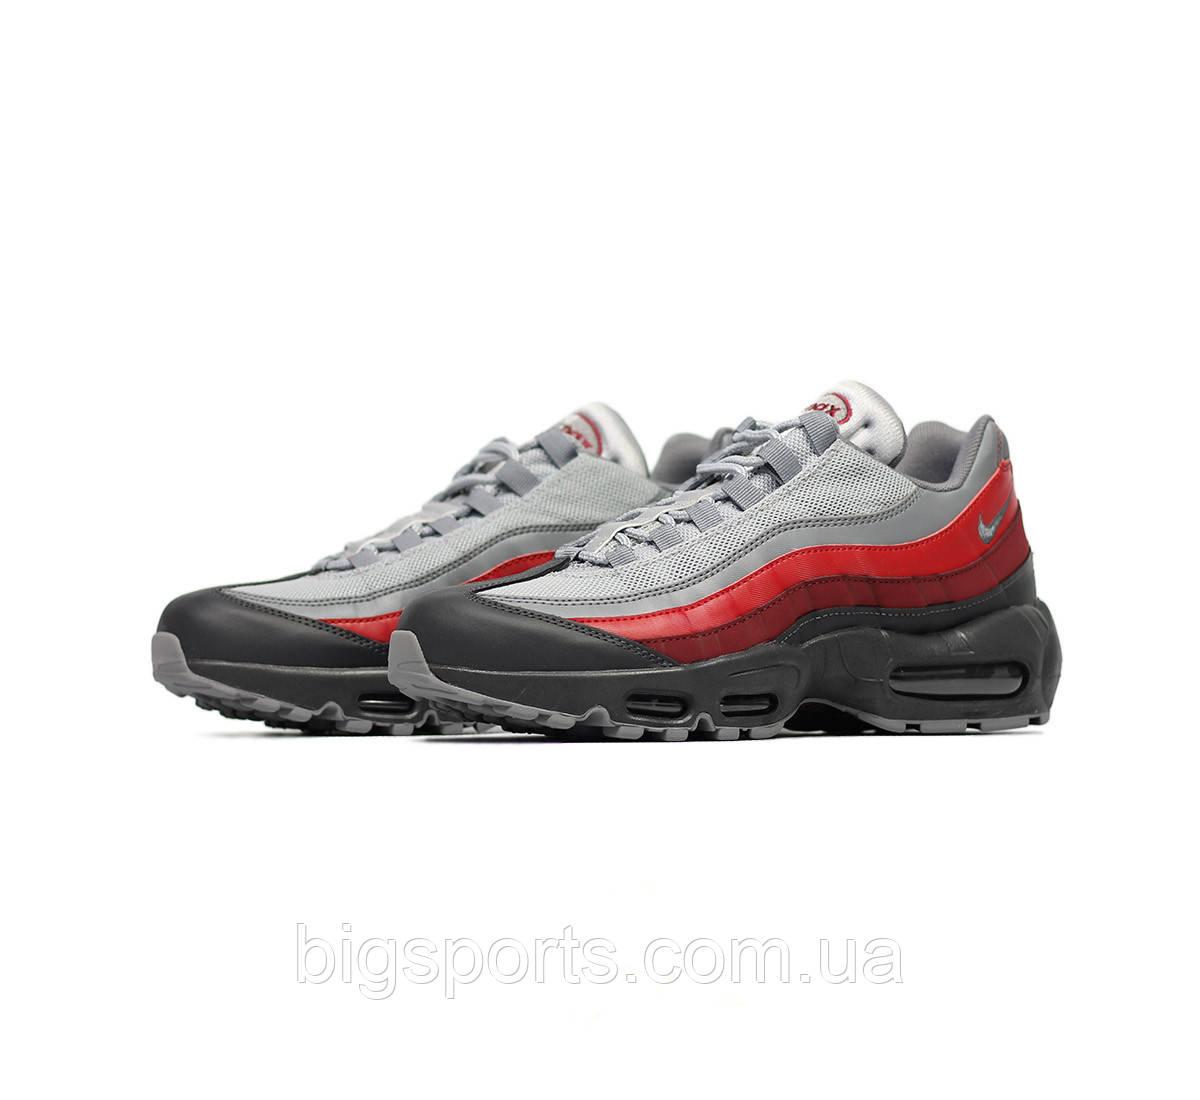 Кроссовки муж. Nike Air Max 95 Essential (арт. 749766-025), фото 1